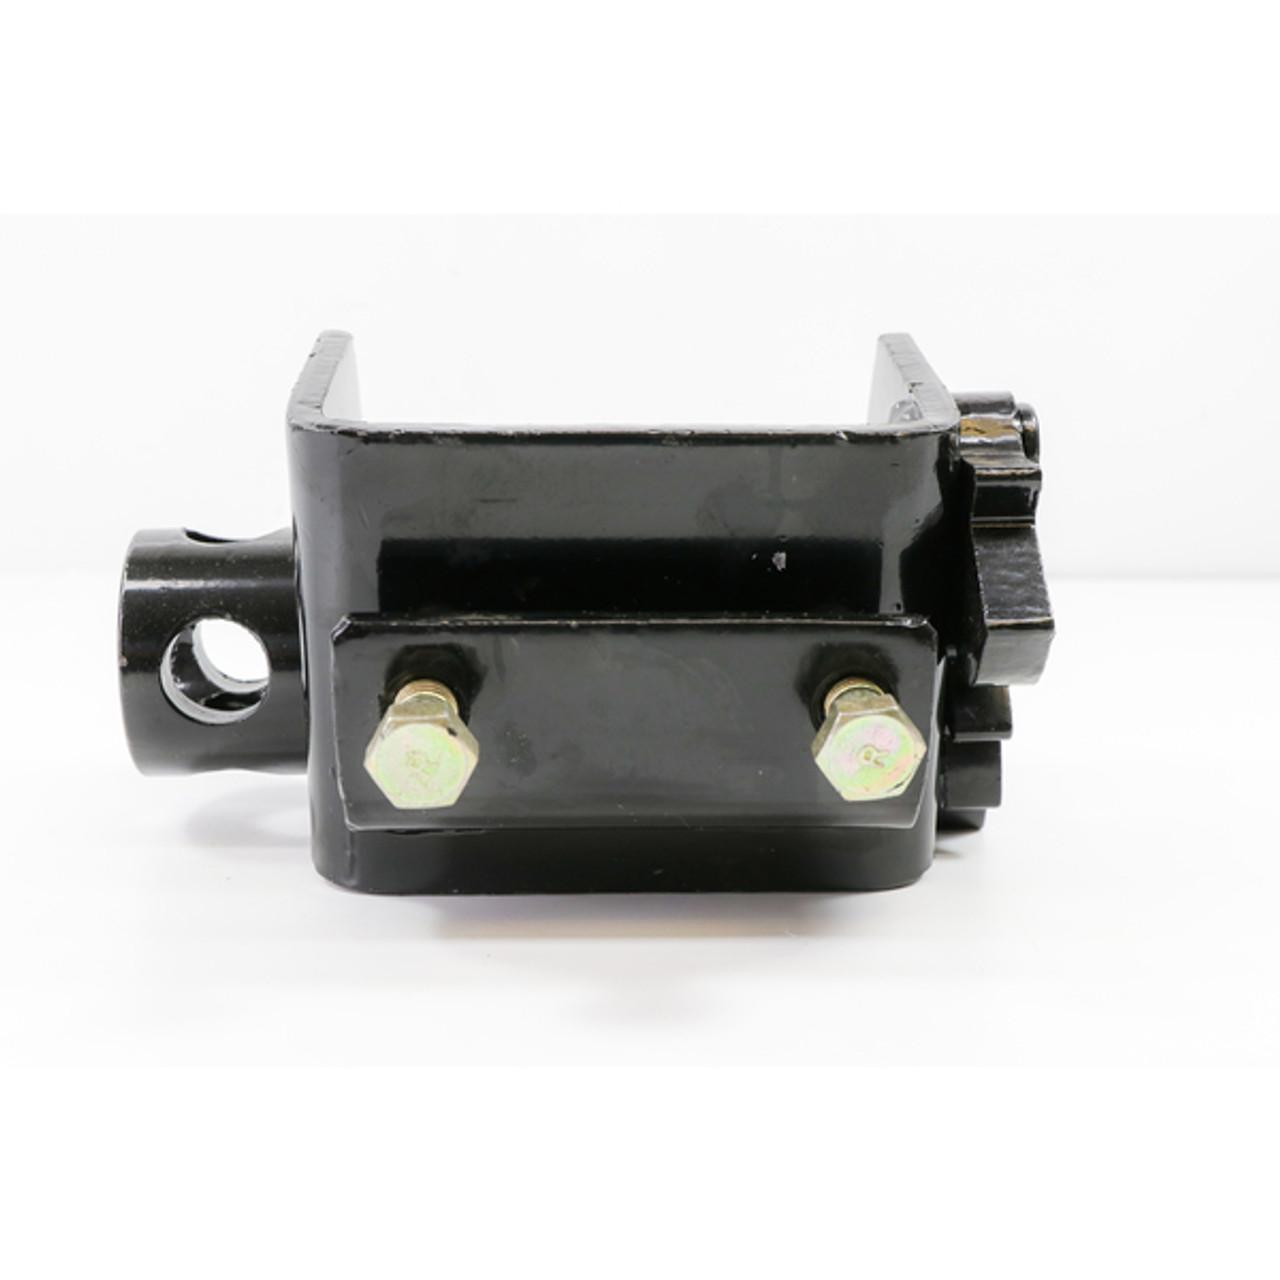 Low Profile Side Mount Portable Winch